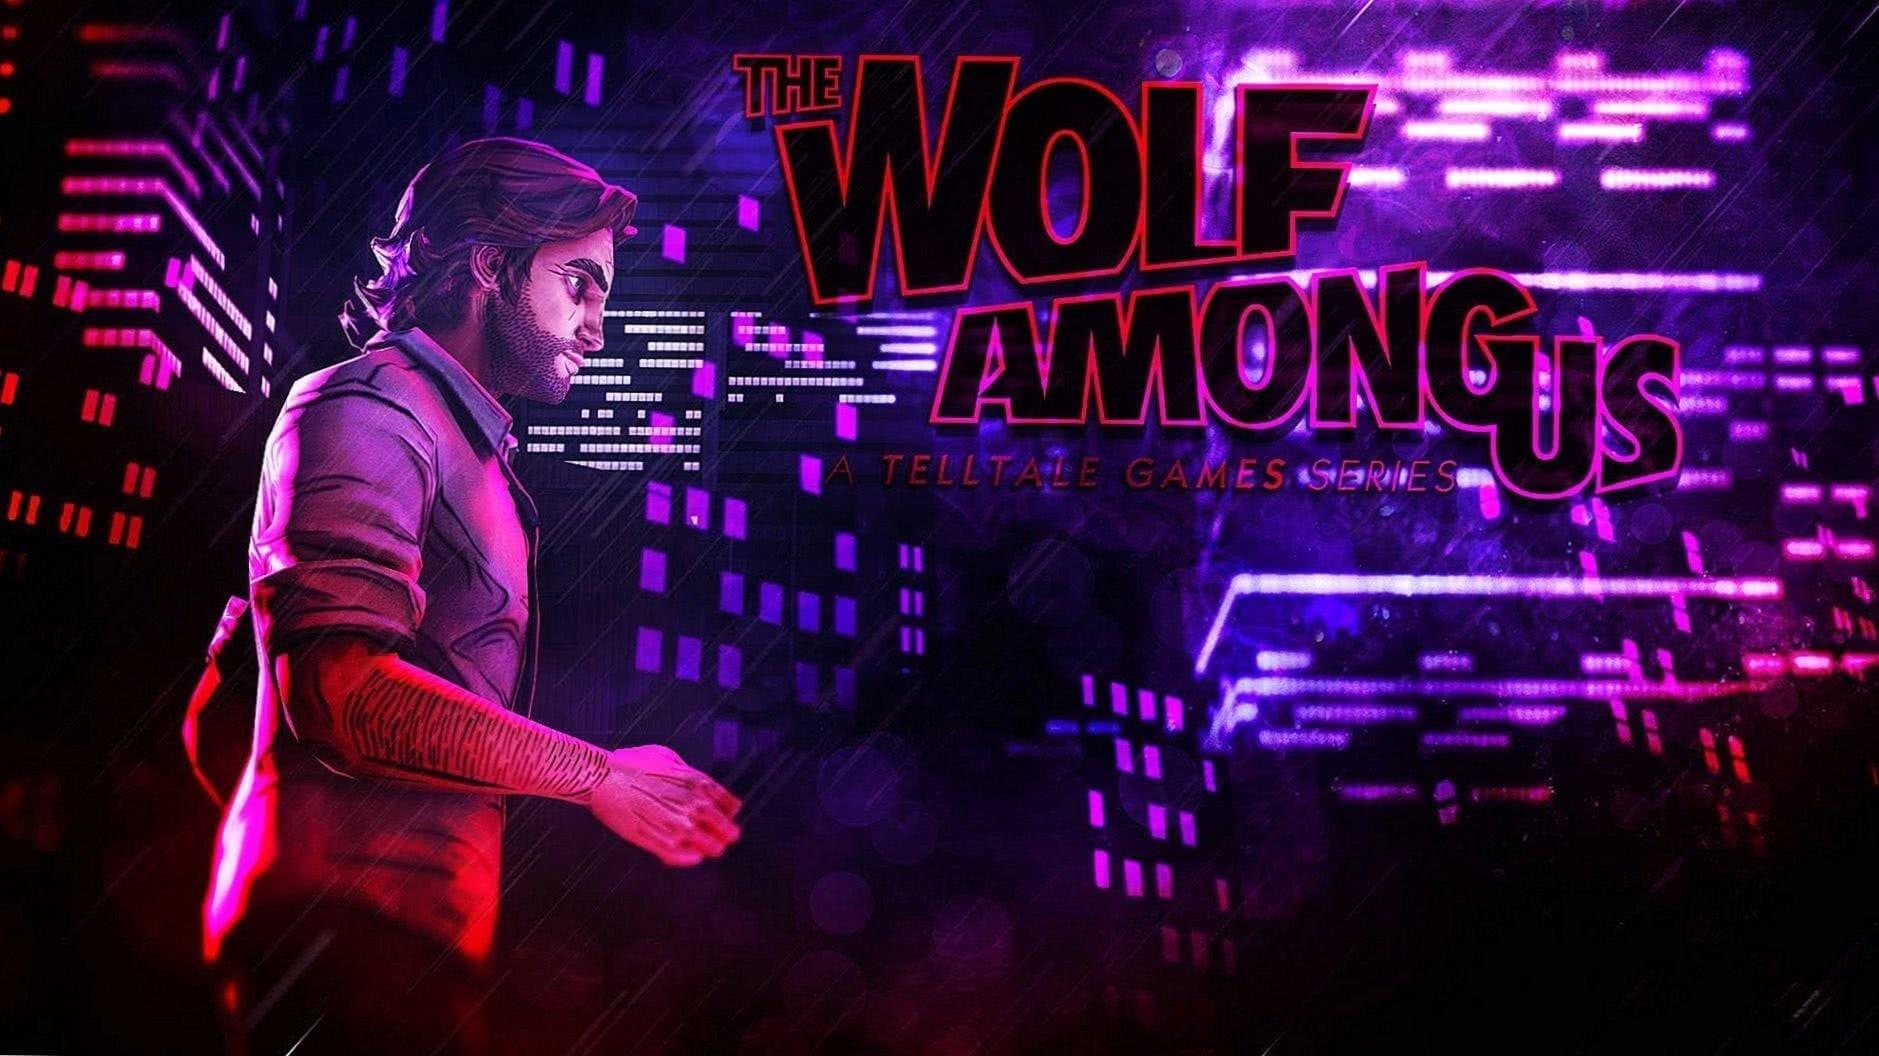 The Wolf Among Us HD Wallpaper